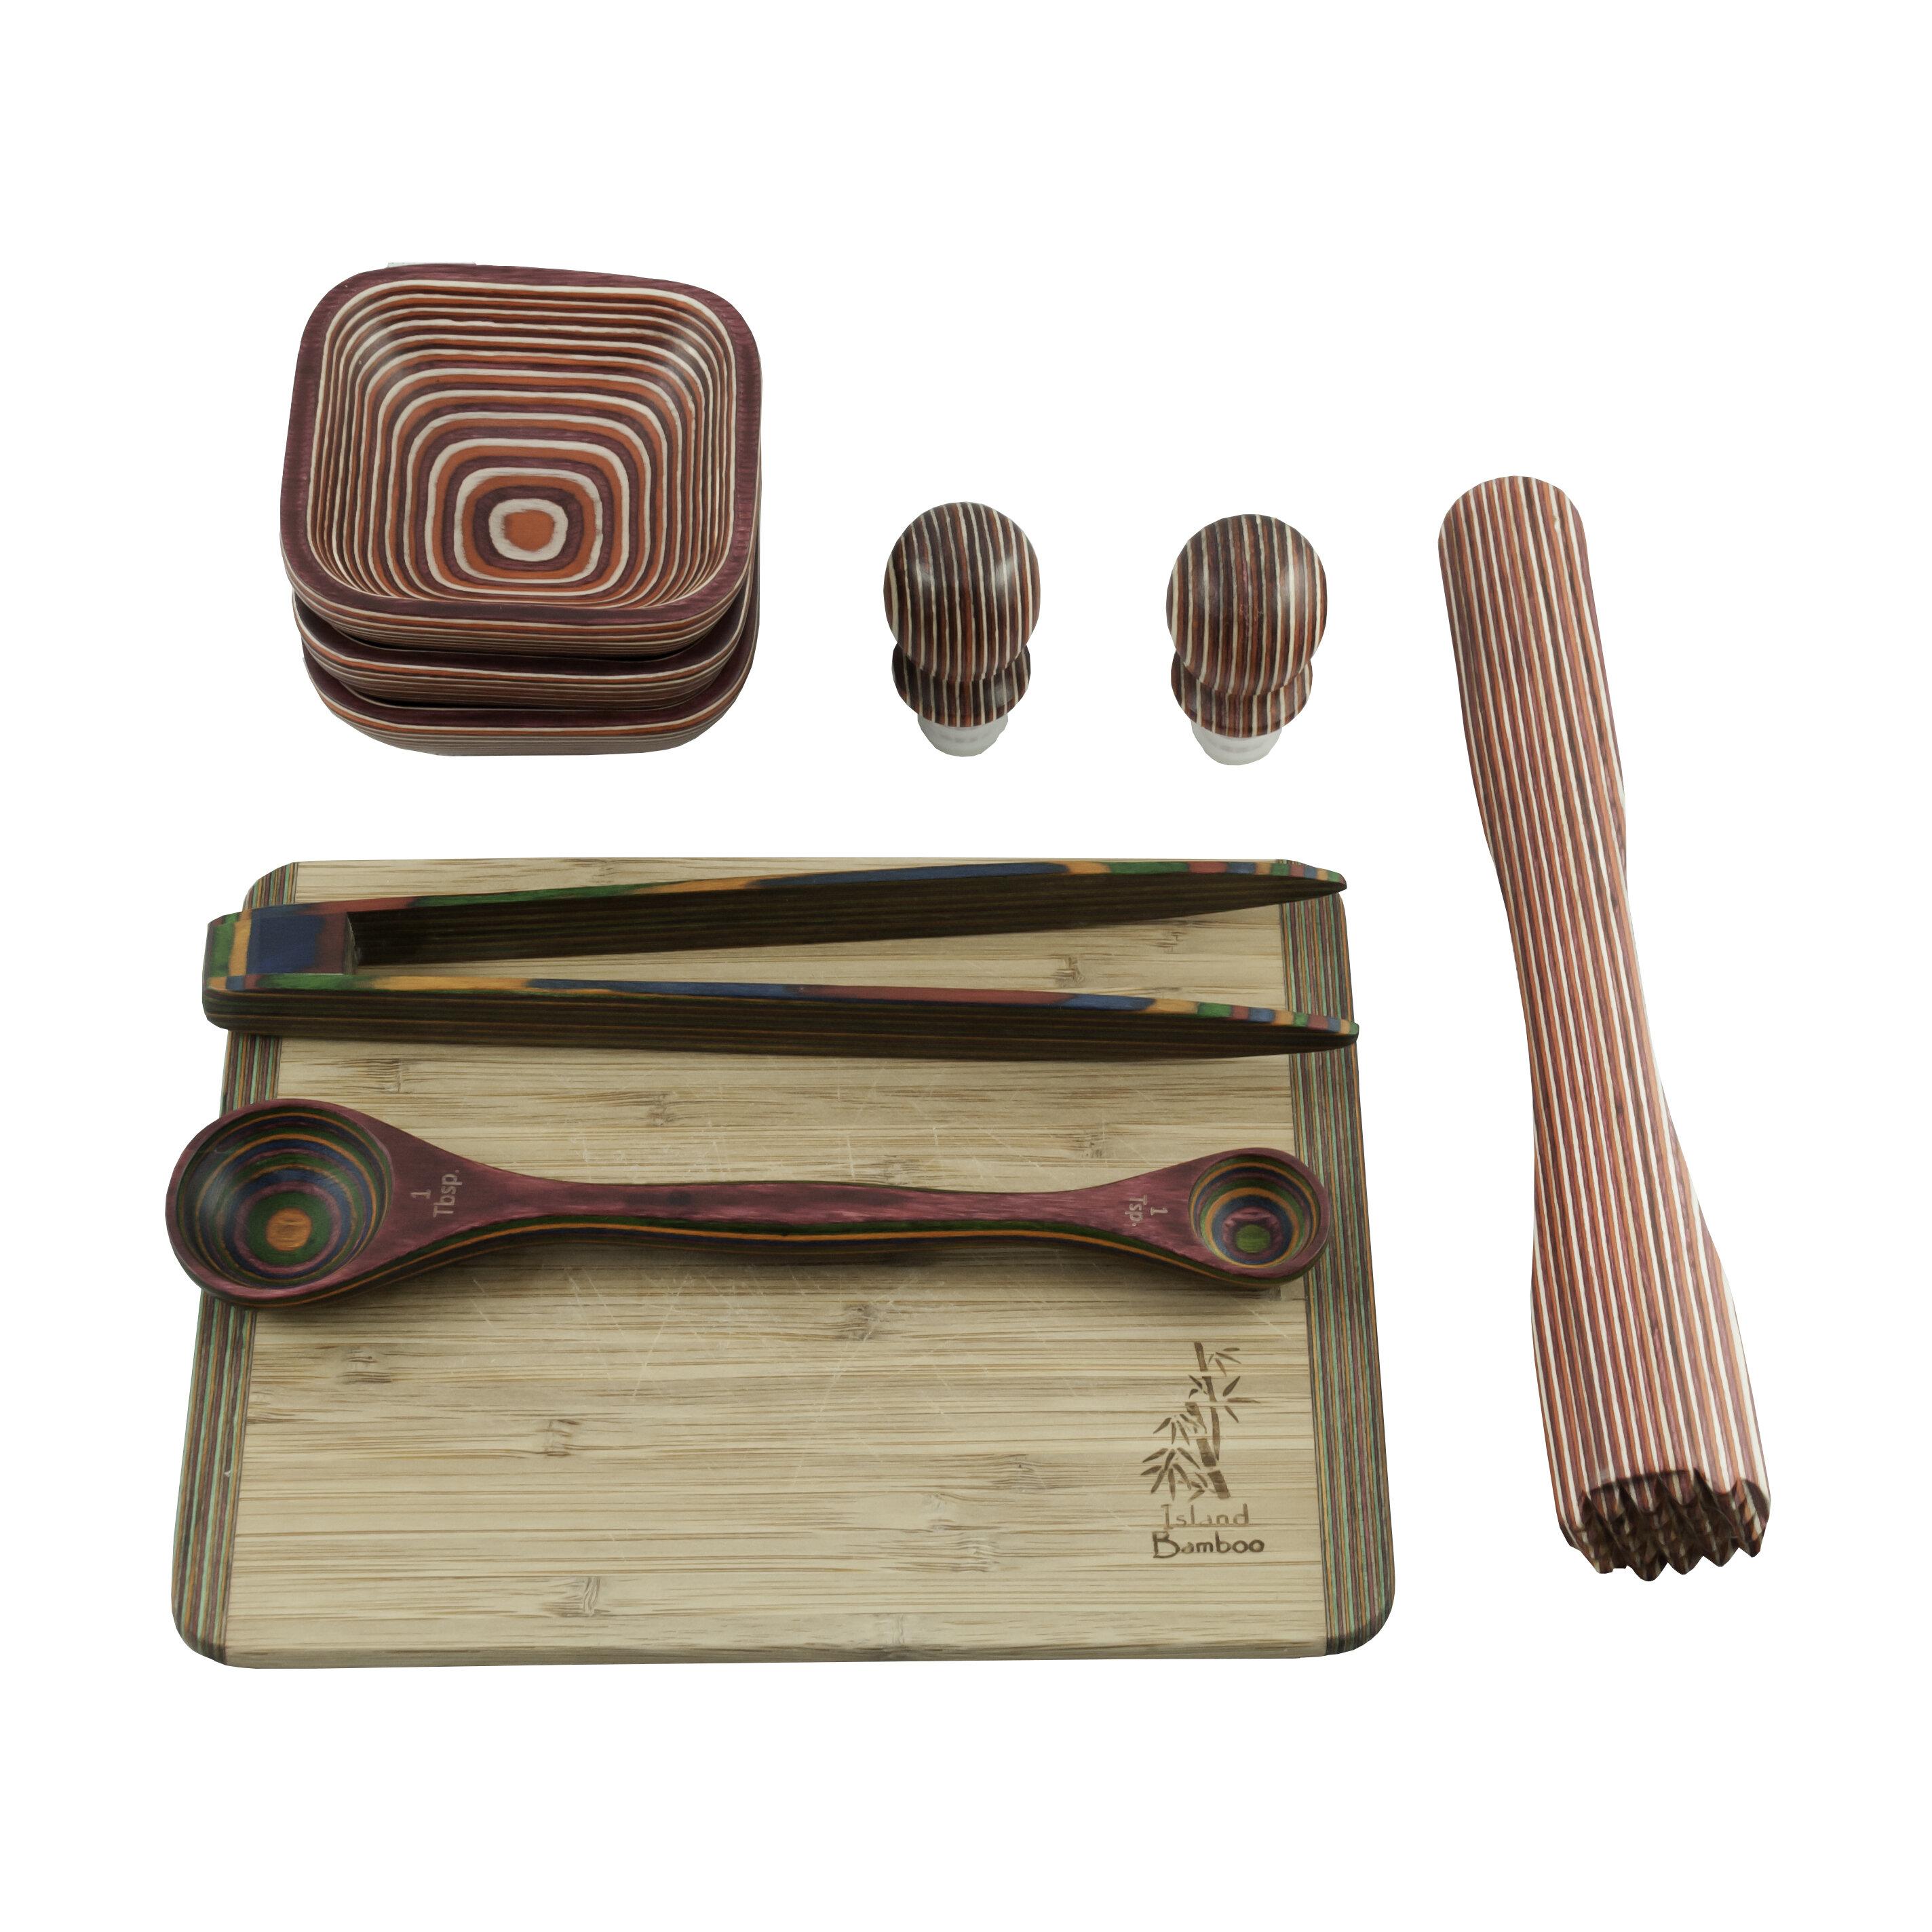 Island Bamboo 9 Piece Pakka Wood Utensil Set Wayfair